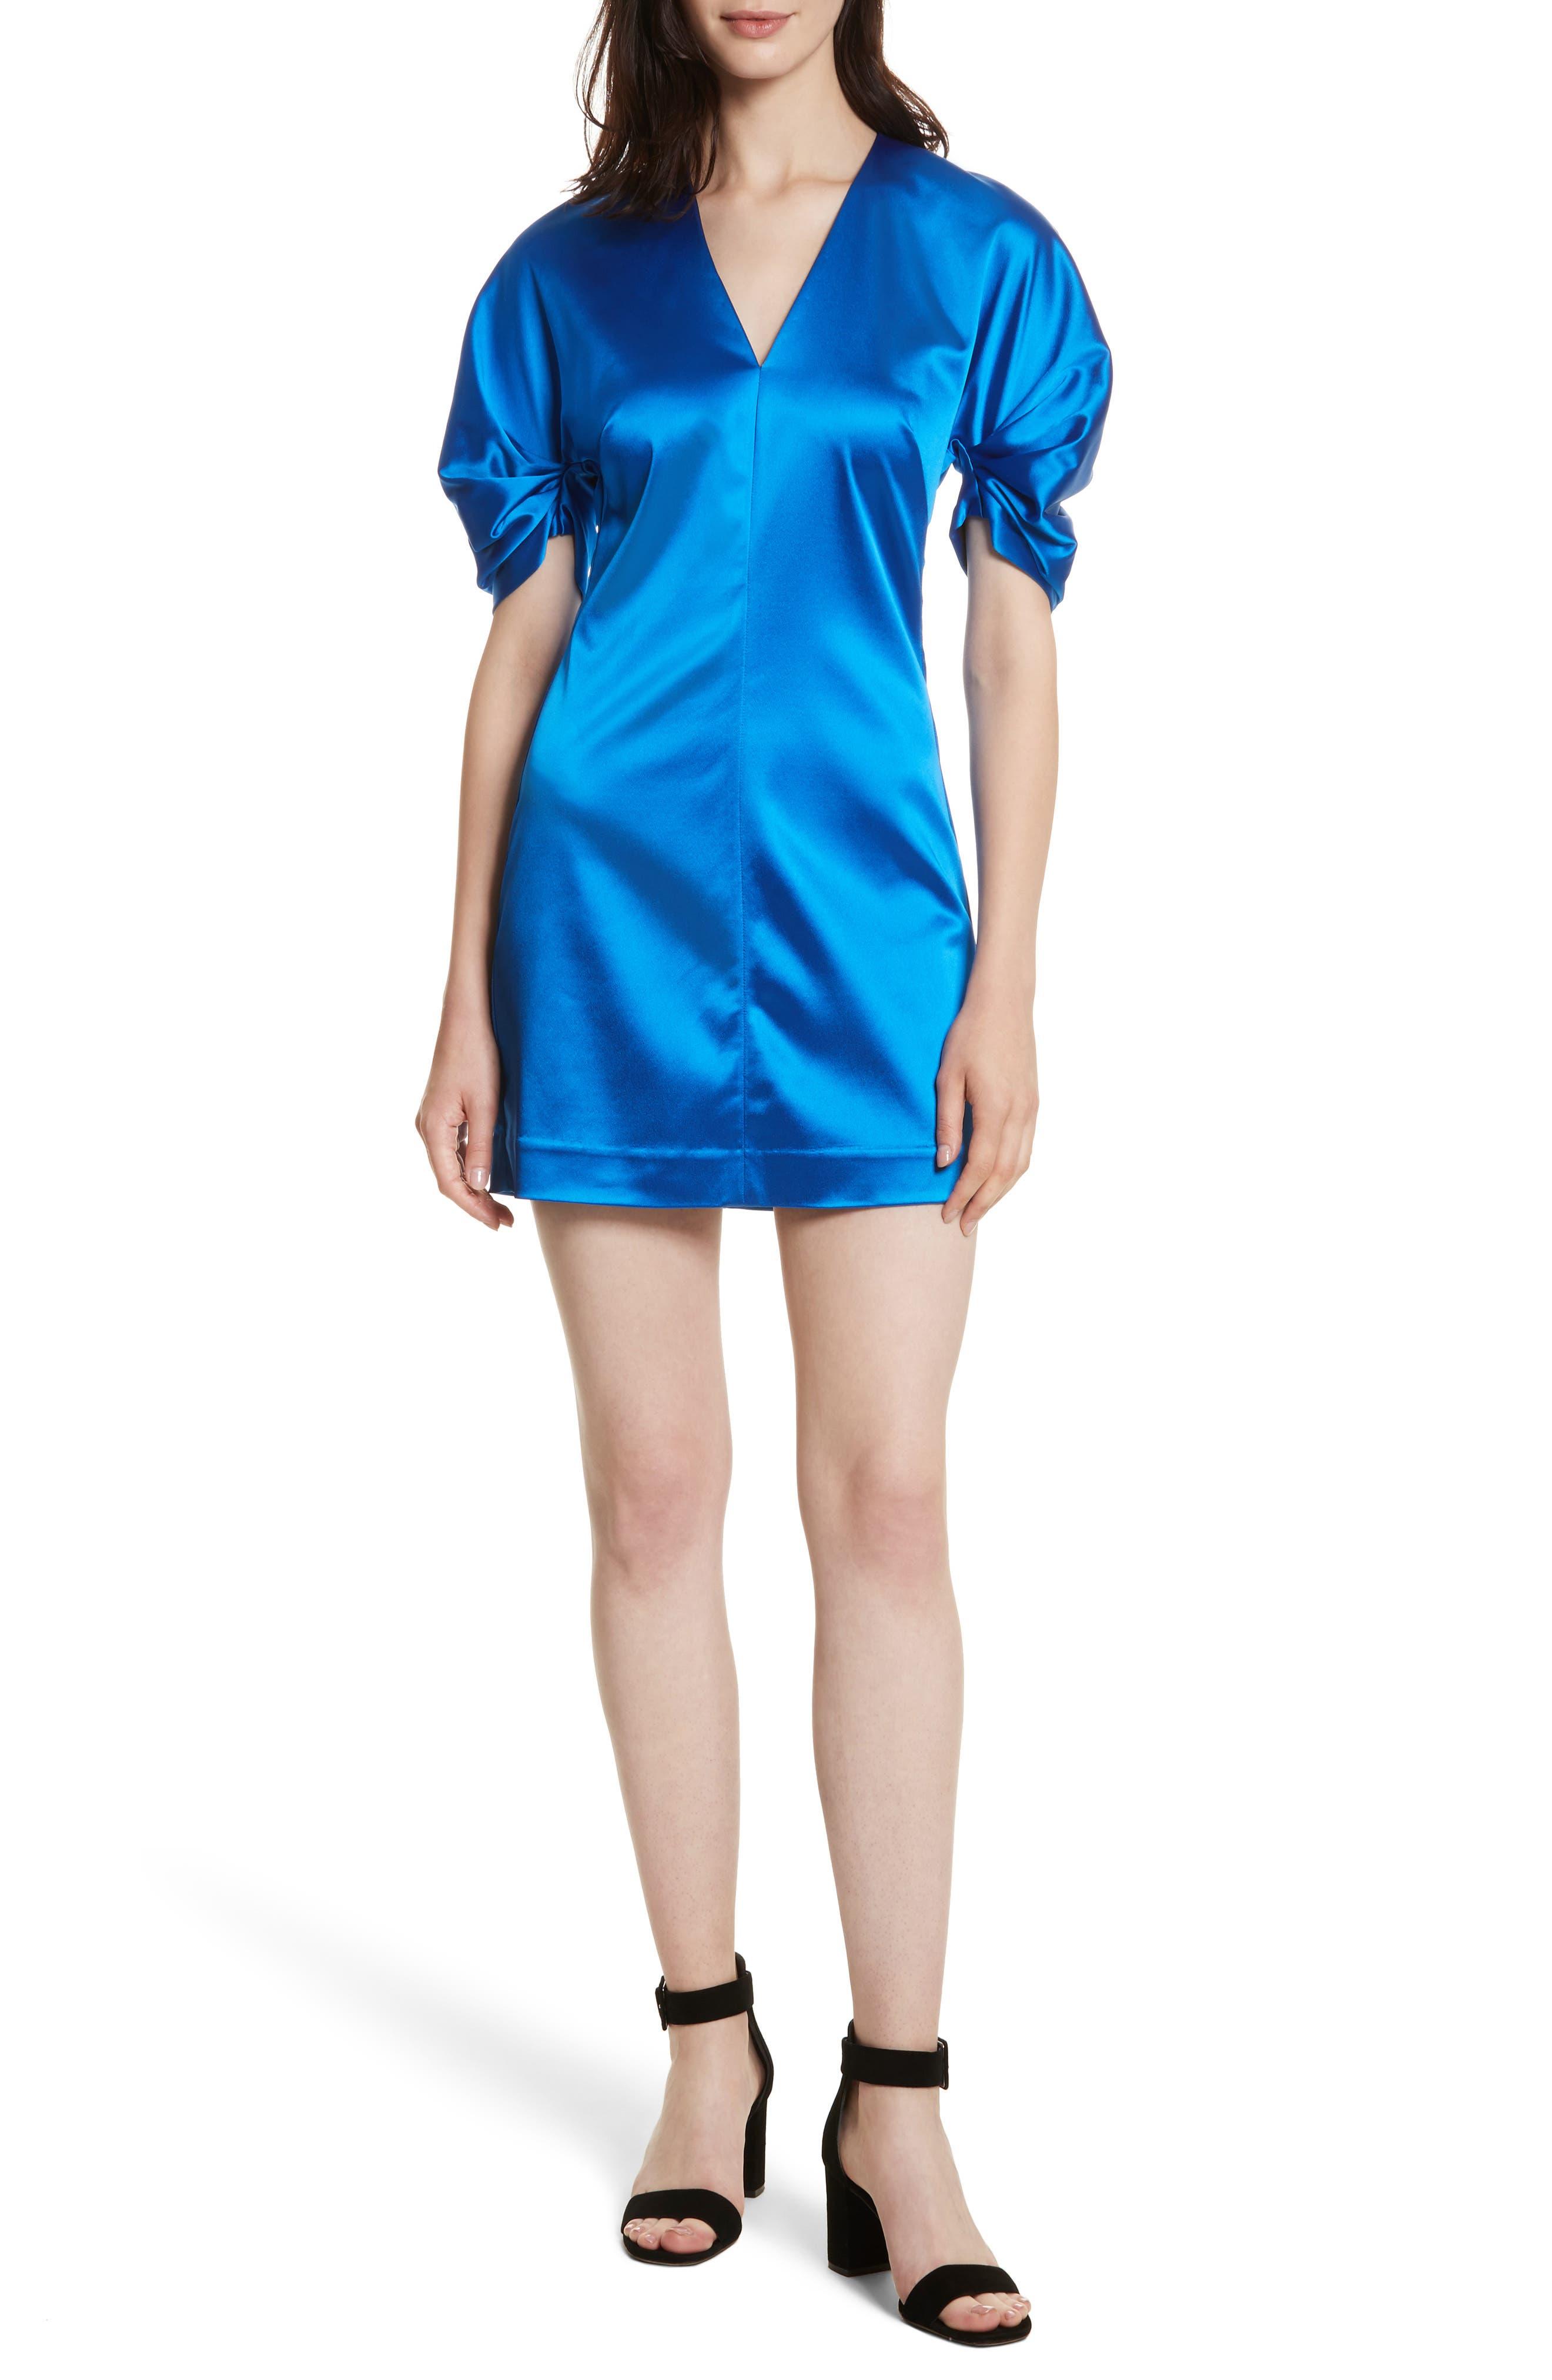 Alternate Image 1 Selected - Elizabeth and James Sloan Duchess Satin Dress